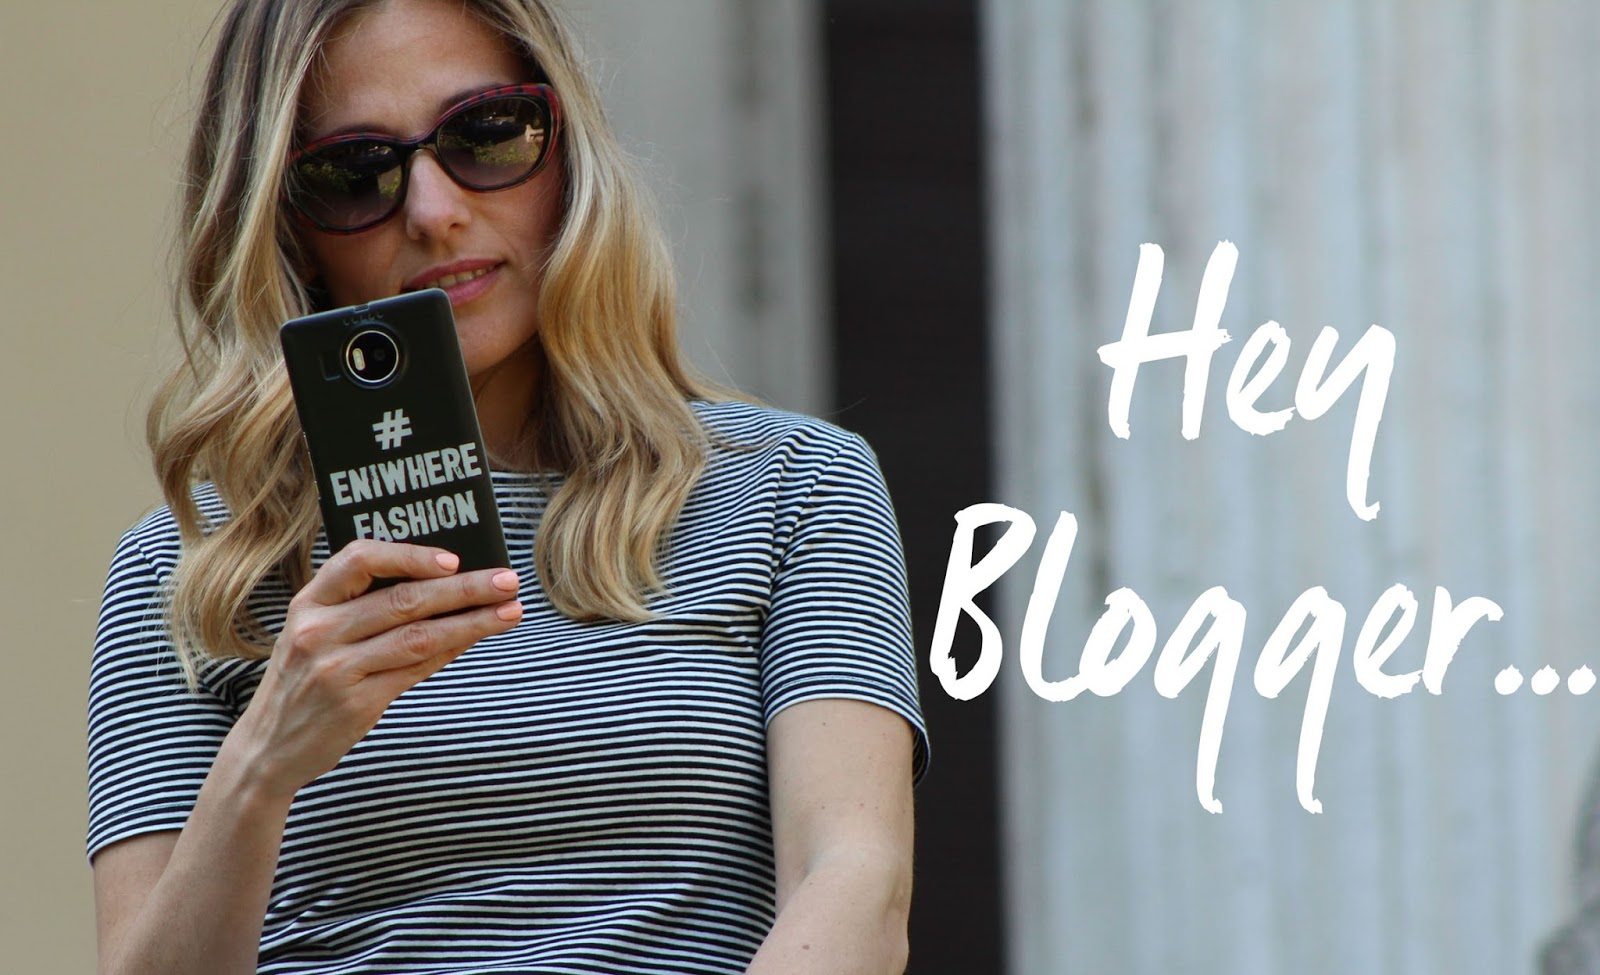 Eniwhere Fashion thoughts Fashion Blog